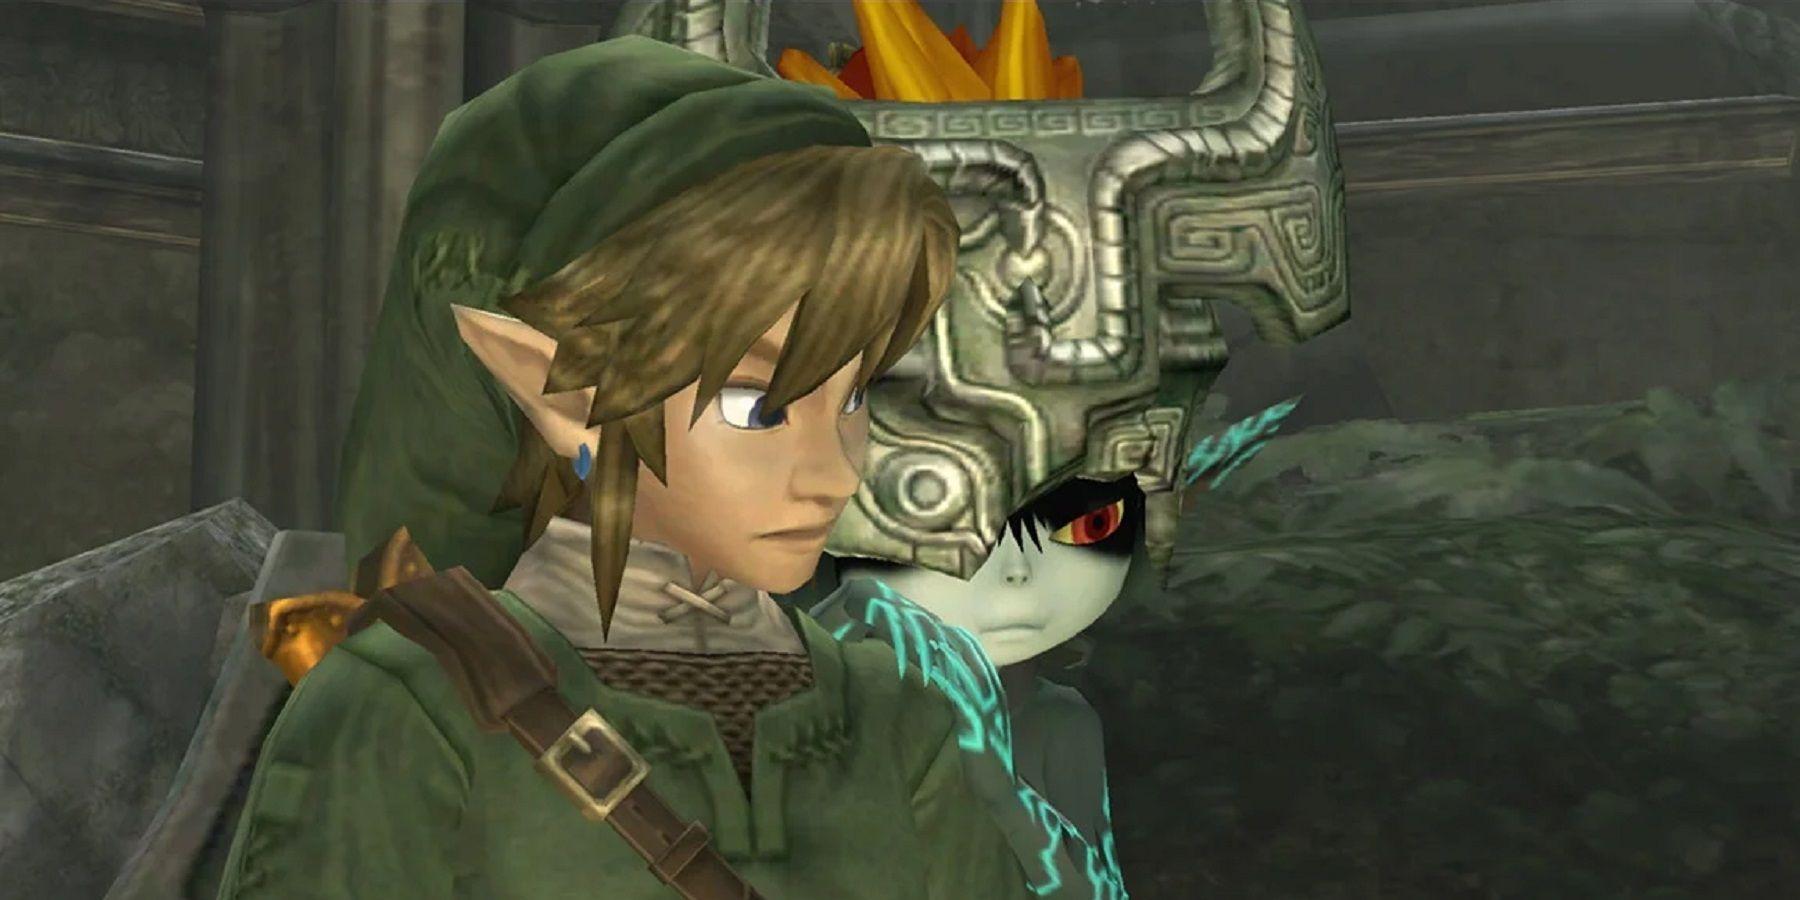 Zelda Fan Shows Off Impressive Twilight Princess Link Cosplay